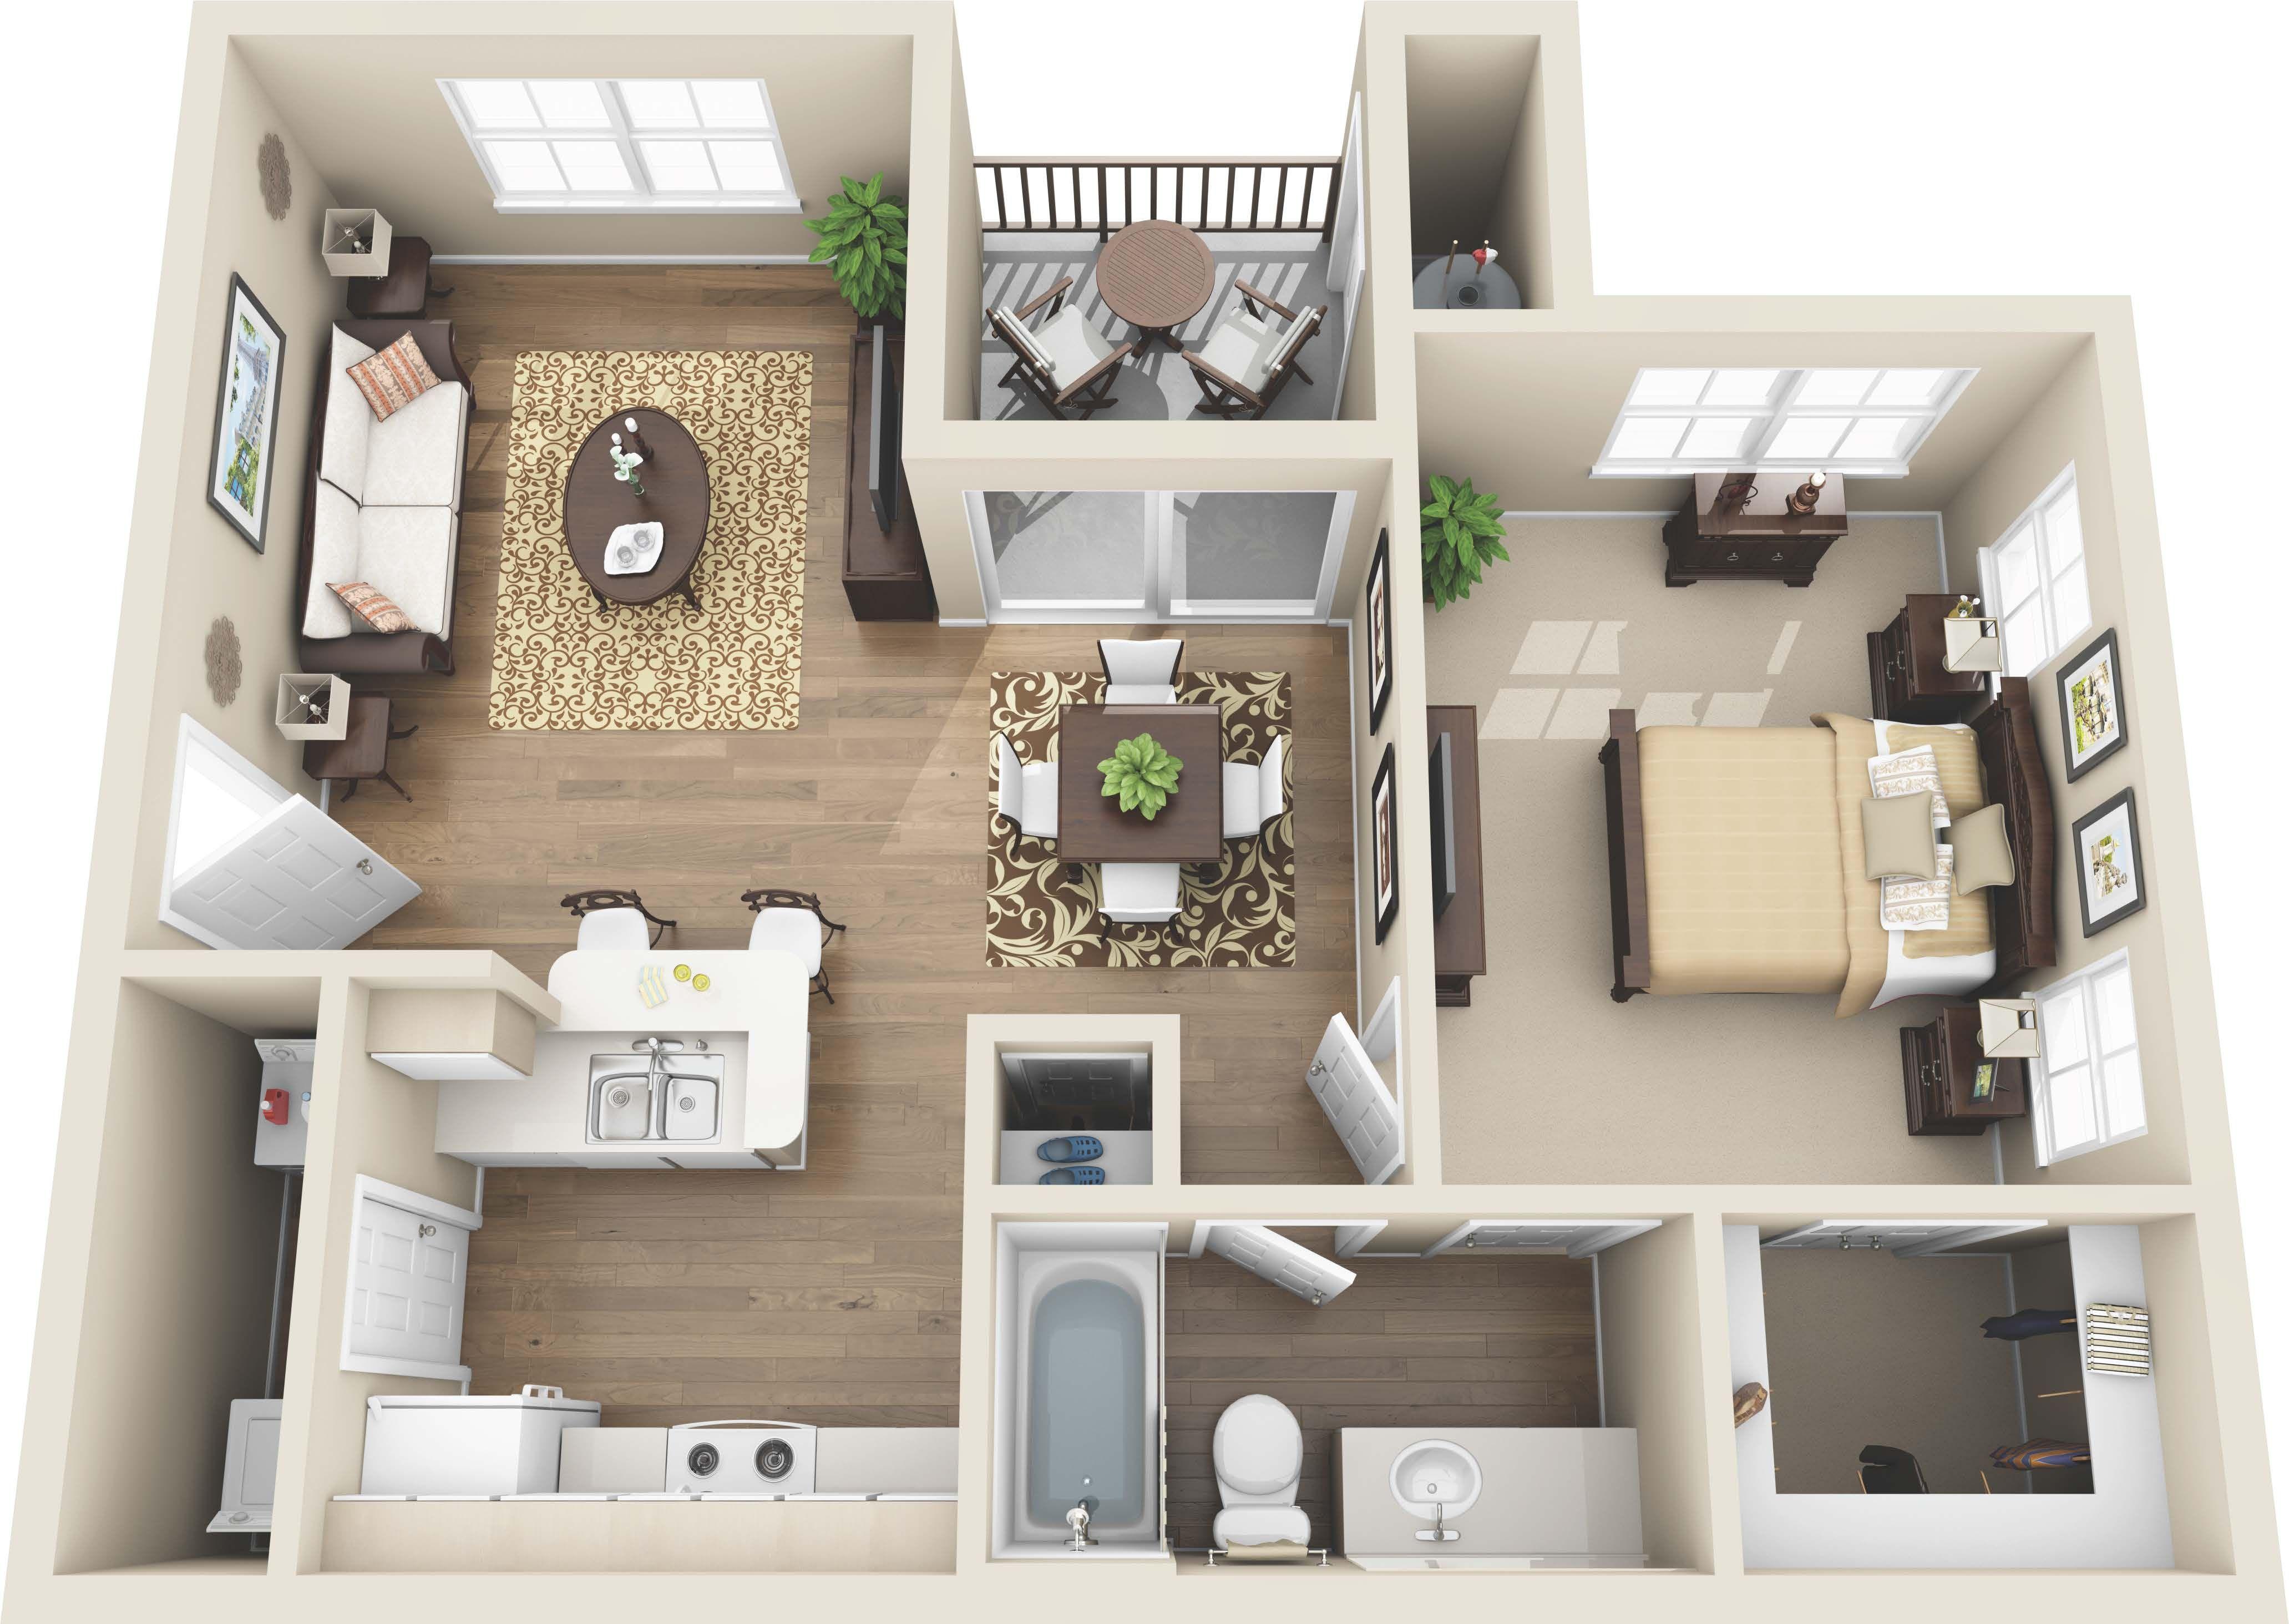 Luxury 1 And 2 Bedroom Colorado Springs Co Apartments Coloradosprings Colorado Apartment Steadfas Sims House Plans House Layout Plans Sims House Design